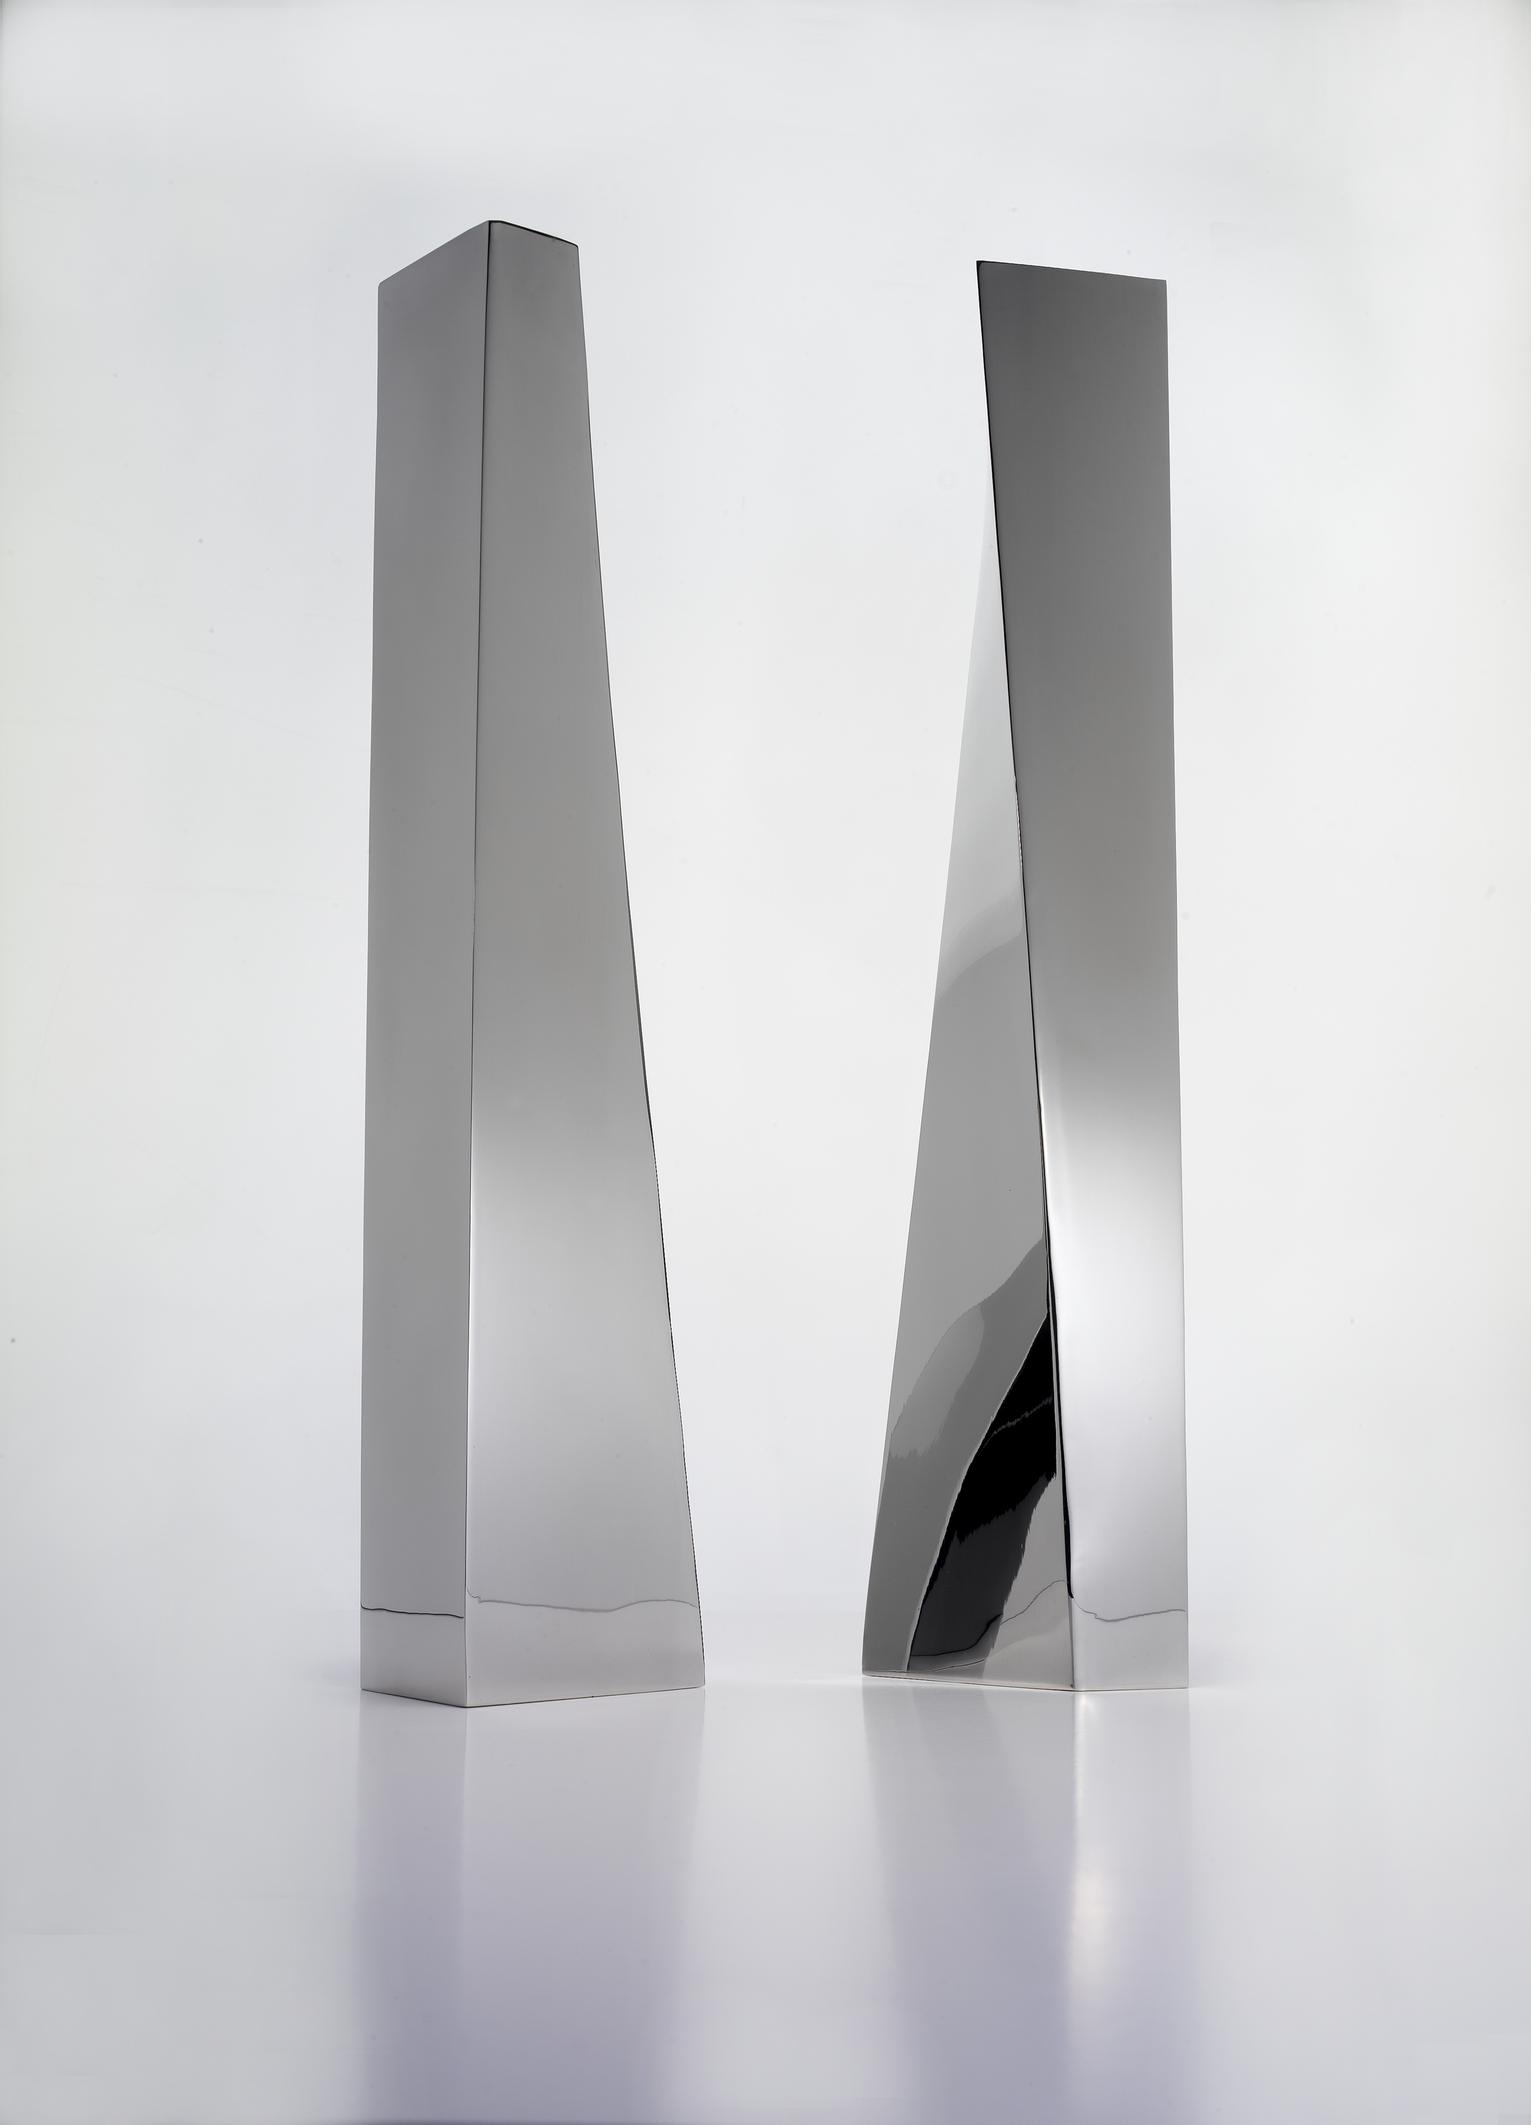 Crevasse Vase Vaso - Alessi 2005 / 2011 courtesy Alessi